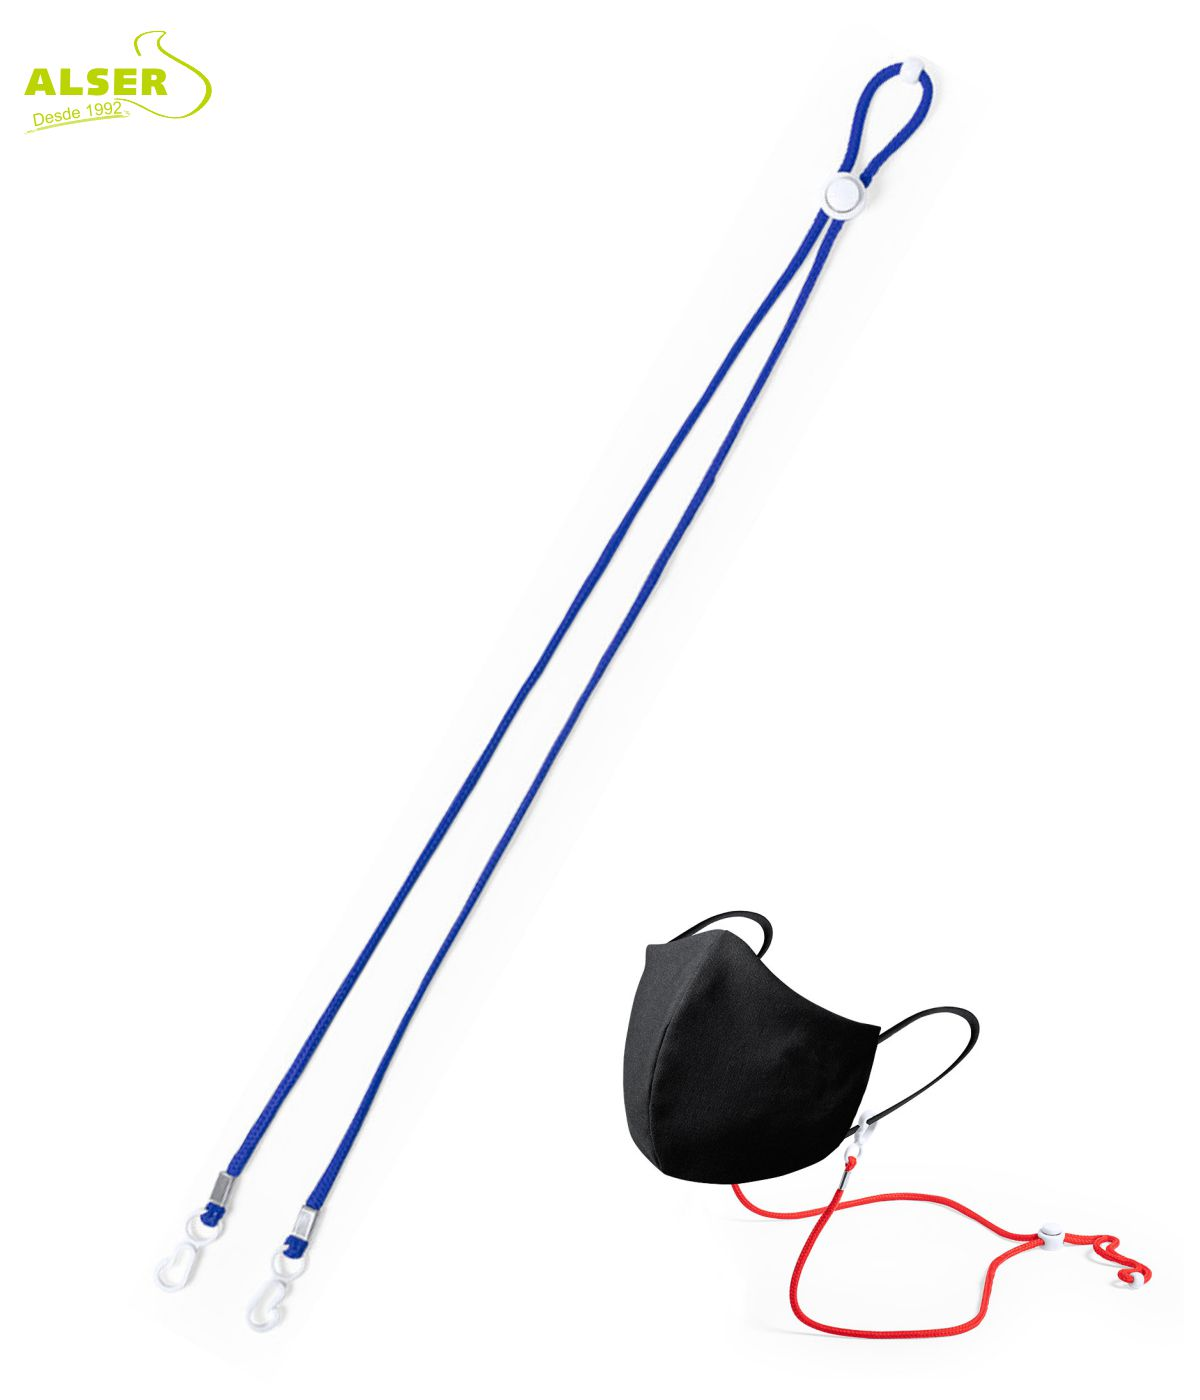 Cordon cuelga mascarillas azul